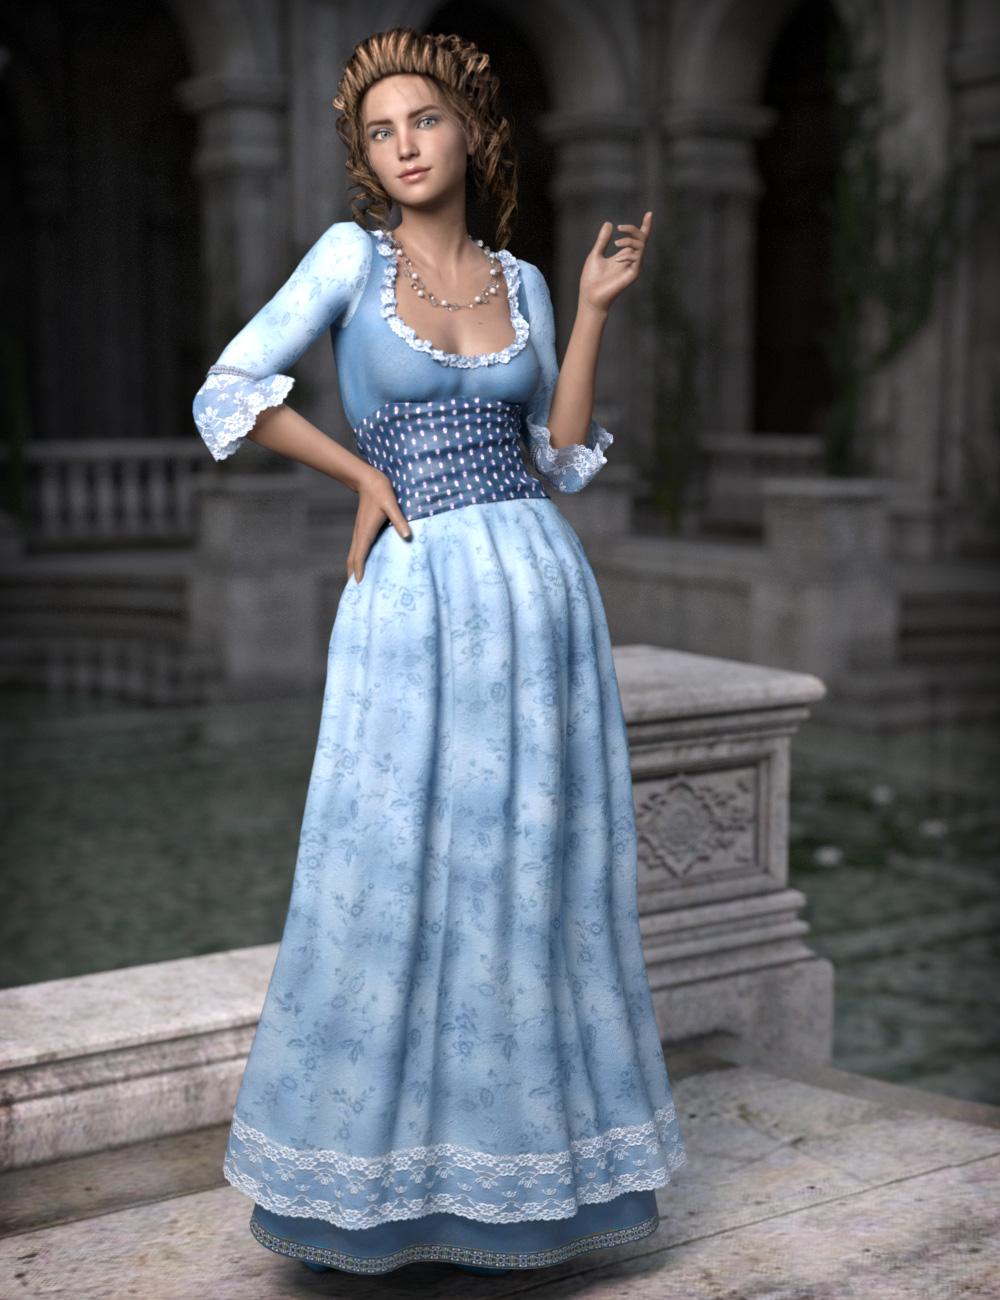 Fairytale Princess for Genesis 3 Female(s) by: esha, 3D Models by Daz 3D